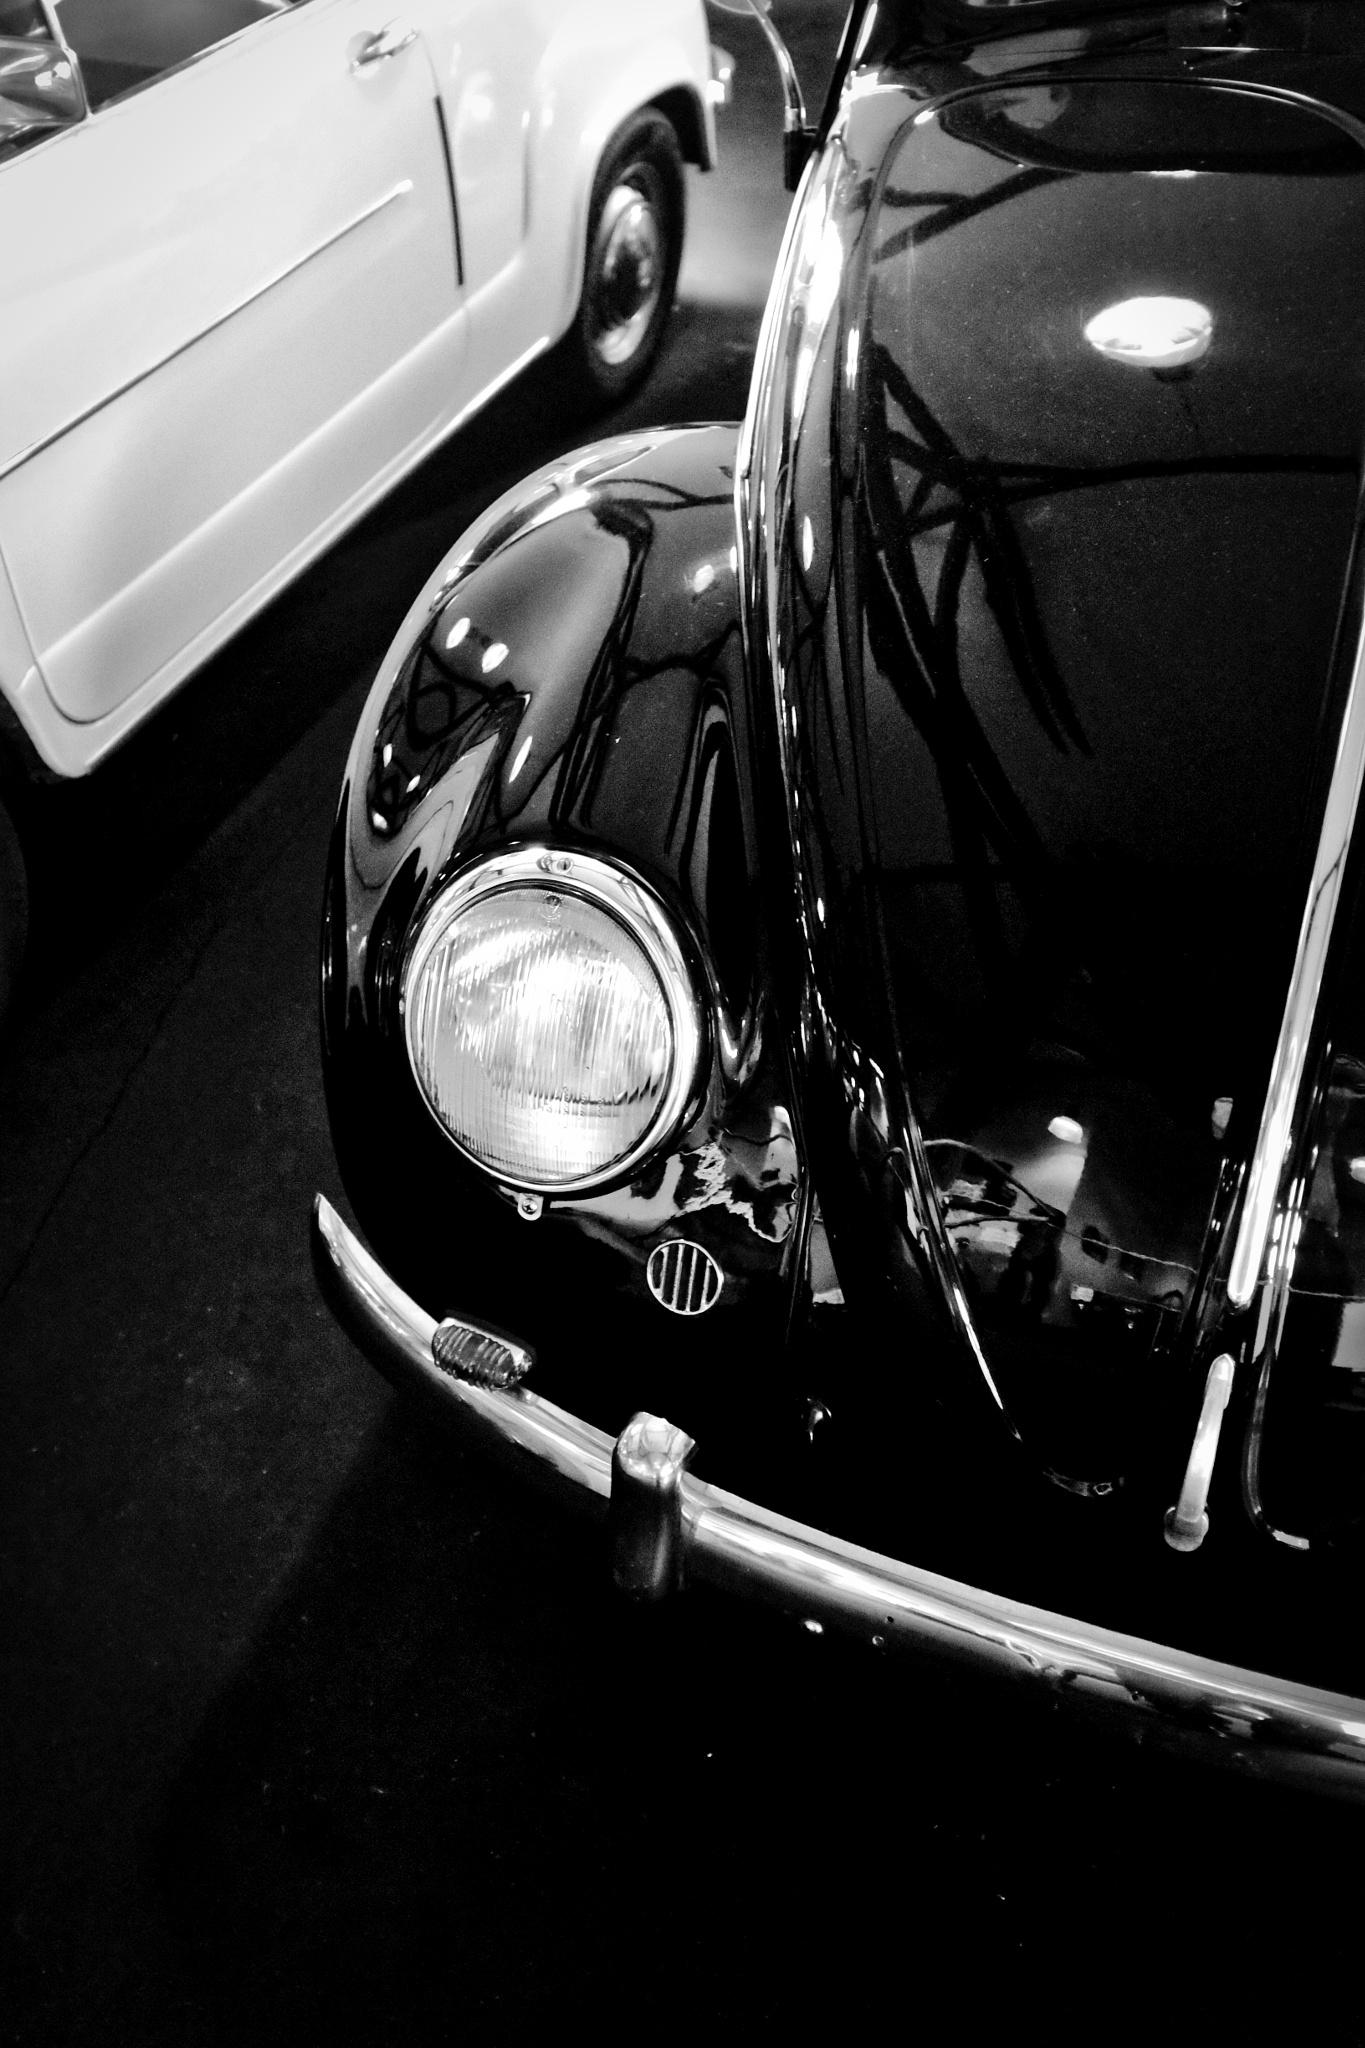 VW Käfer by peterkryzun